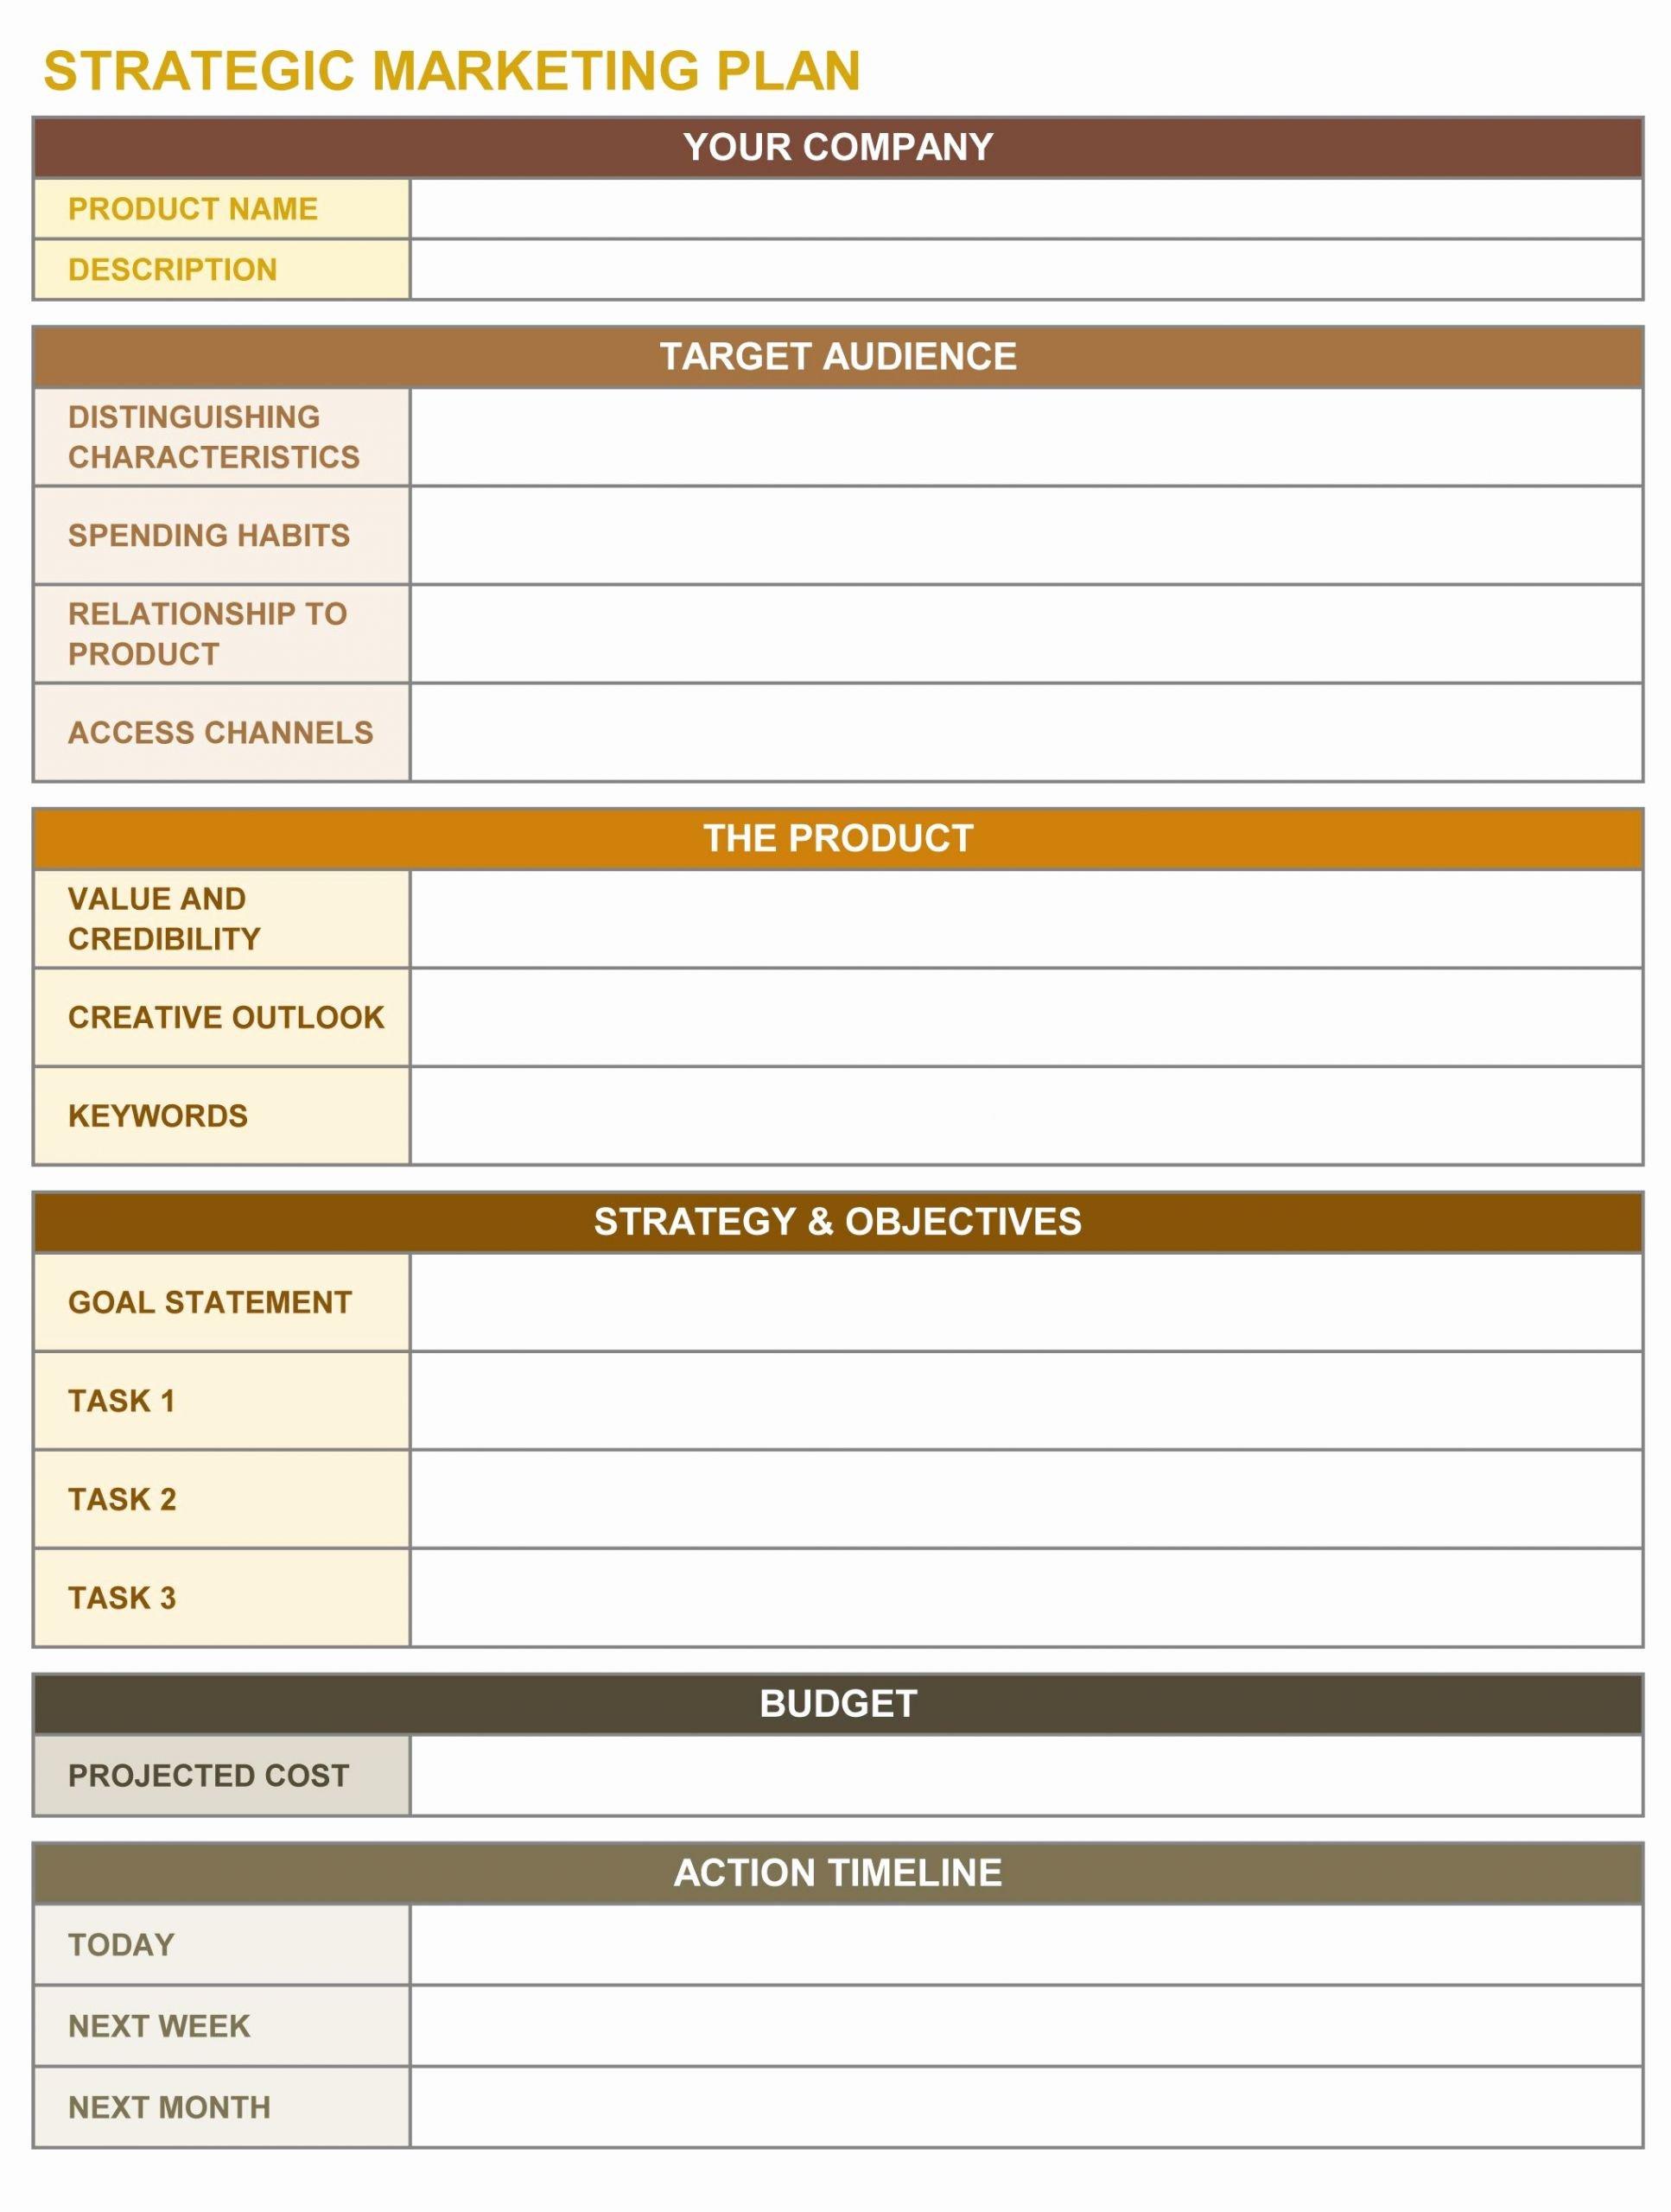 Marketing Action Plan Template Excel Elegant Strategic Marketing Plan Excel Template